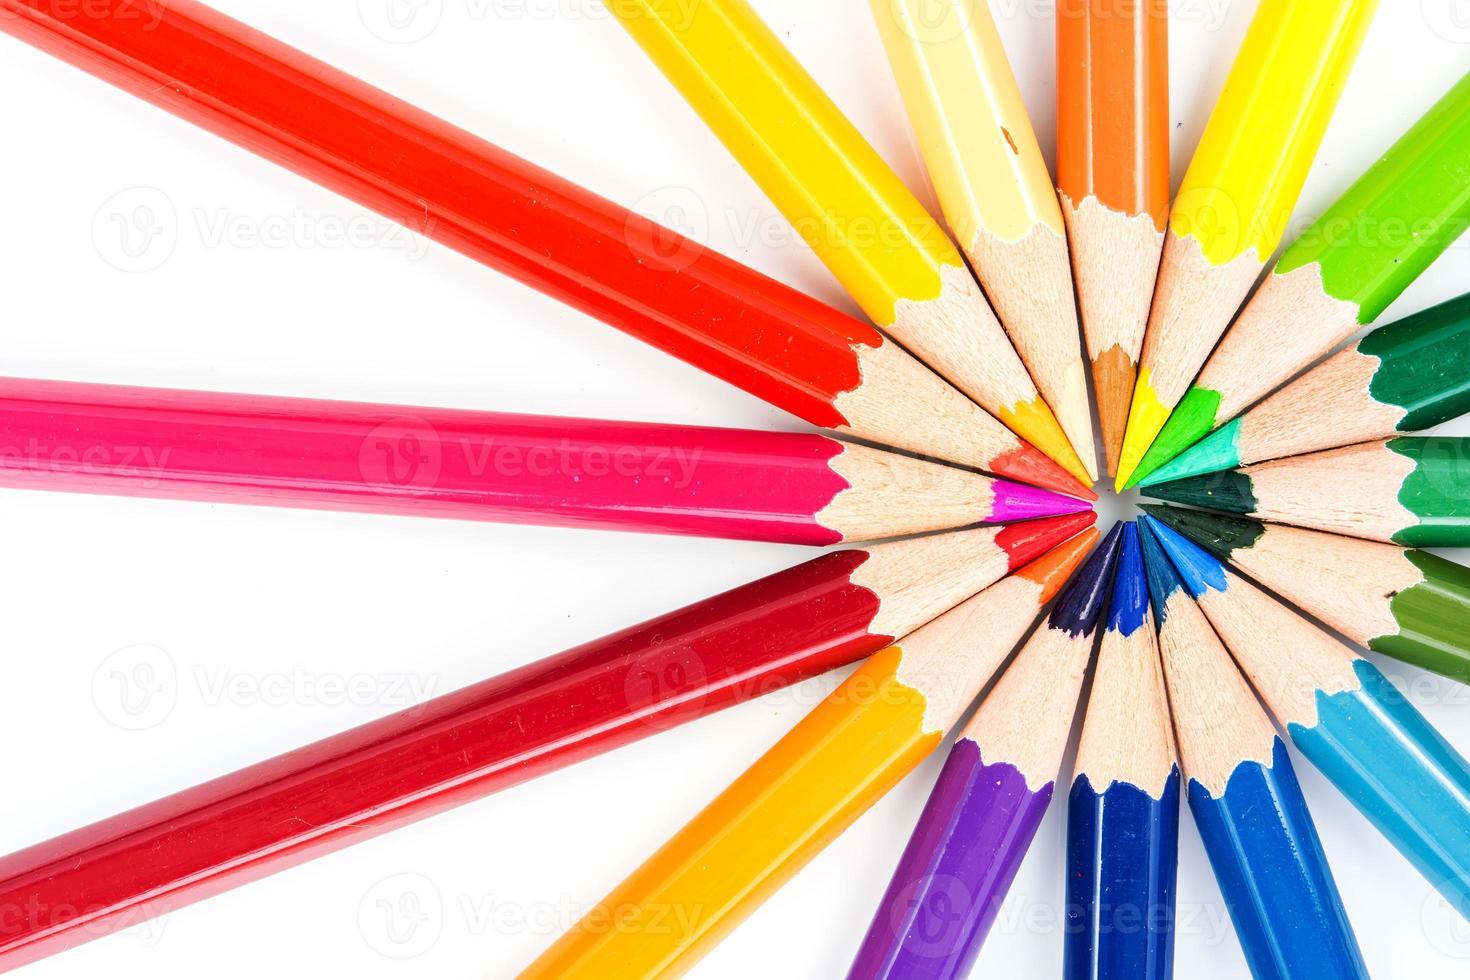 cerrar lápices de colores foto